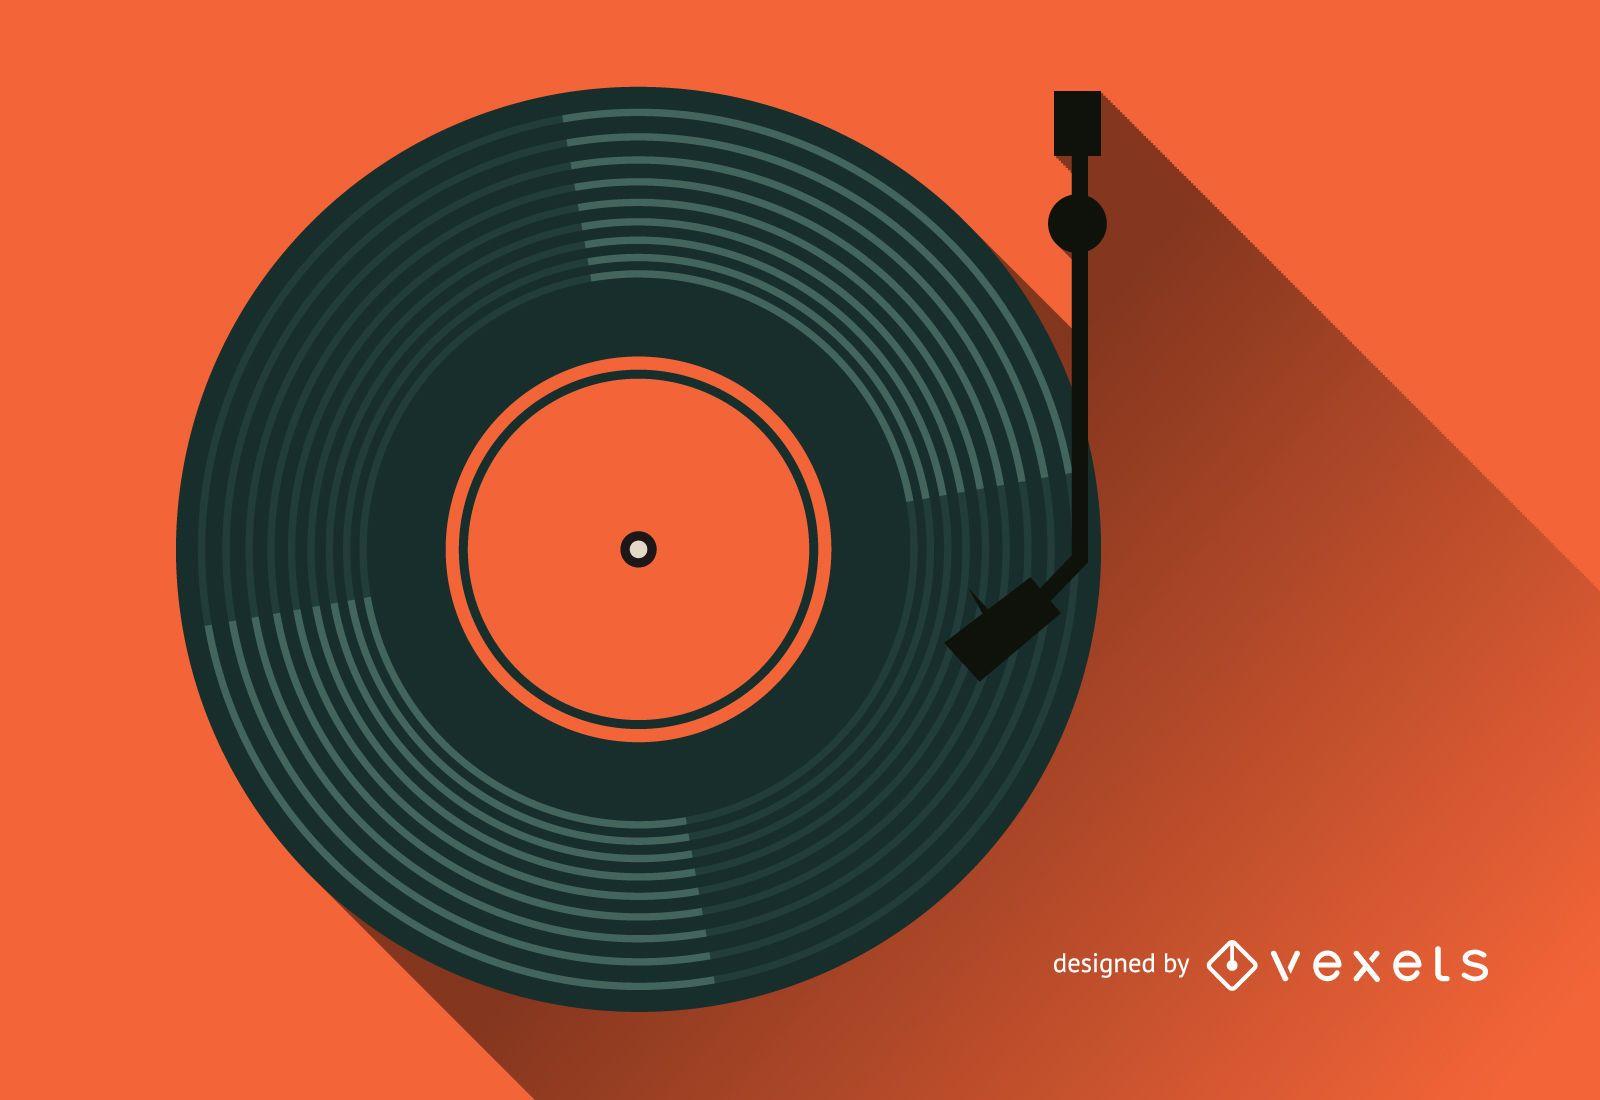 Vinyl Phonograph Record Illustration